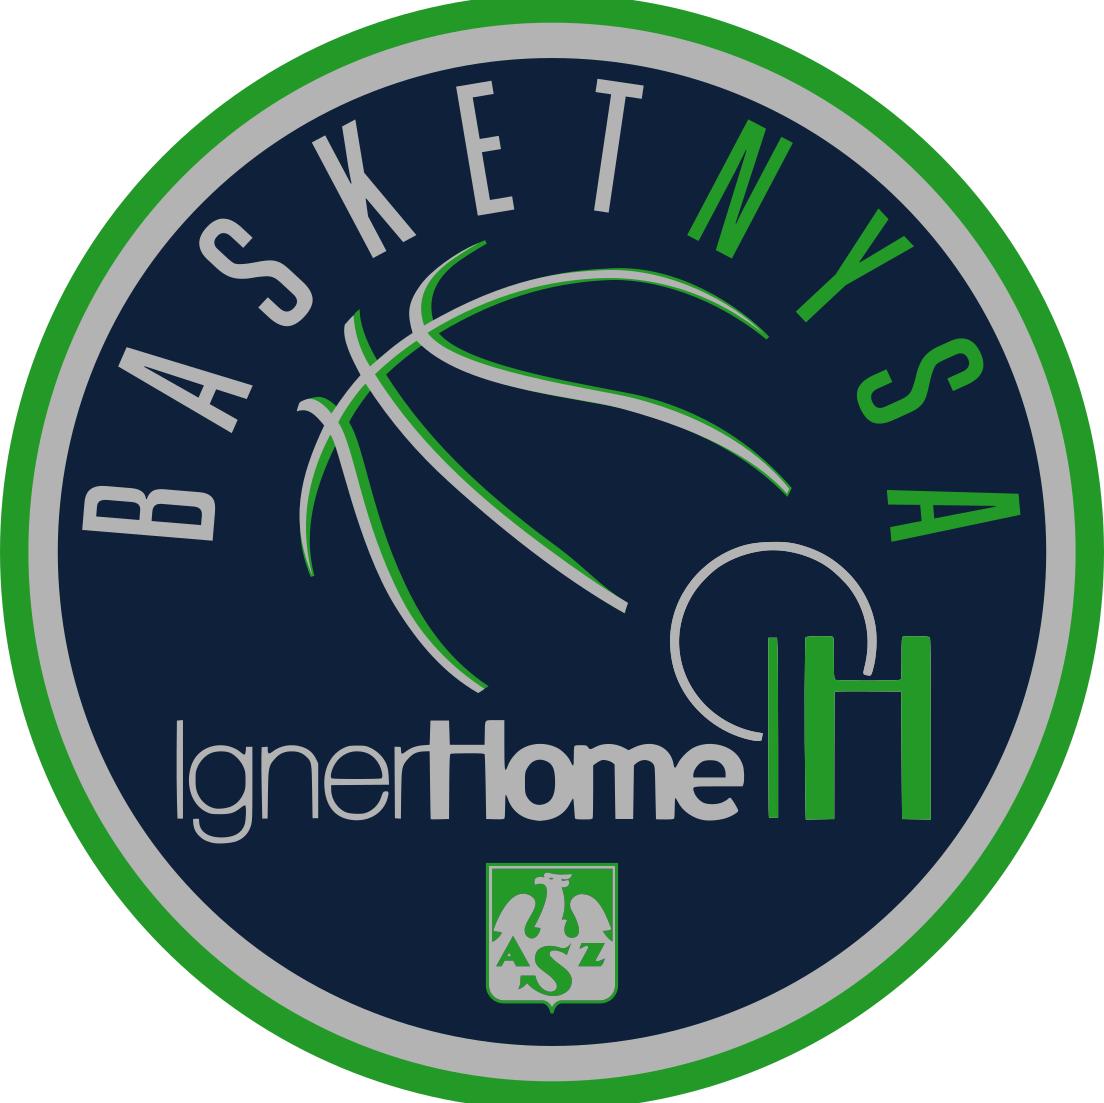 IgnerHome AZS Basket Nysa - BC Swiss Krono Żary